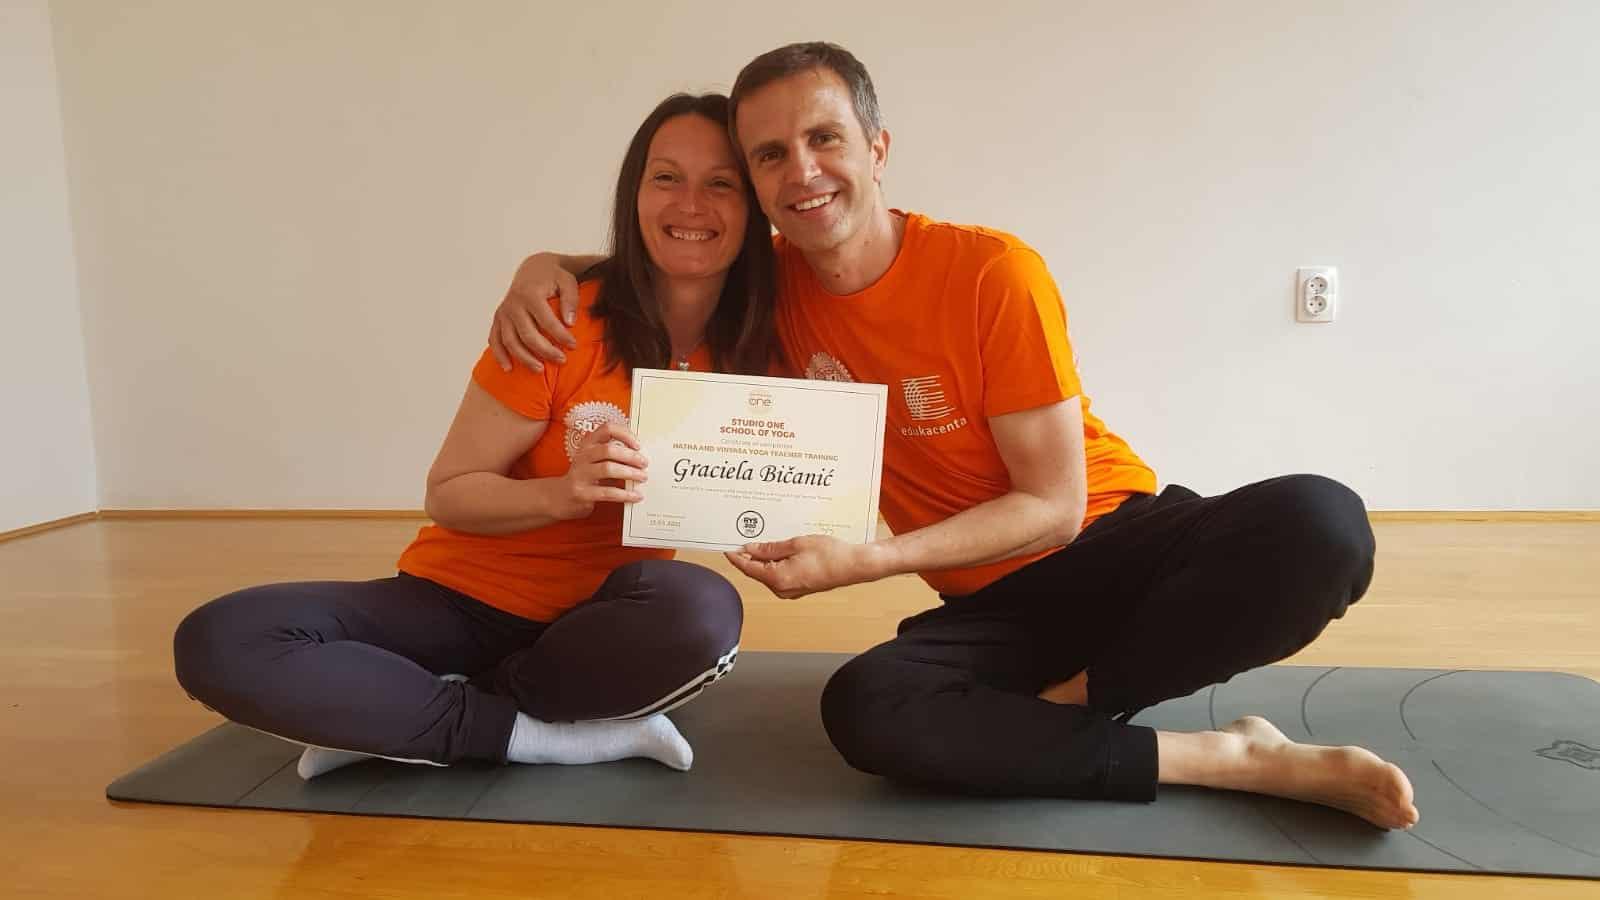 Damir i Graciela Yoga School Rijeka